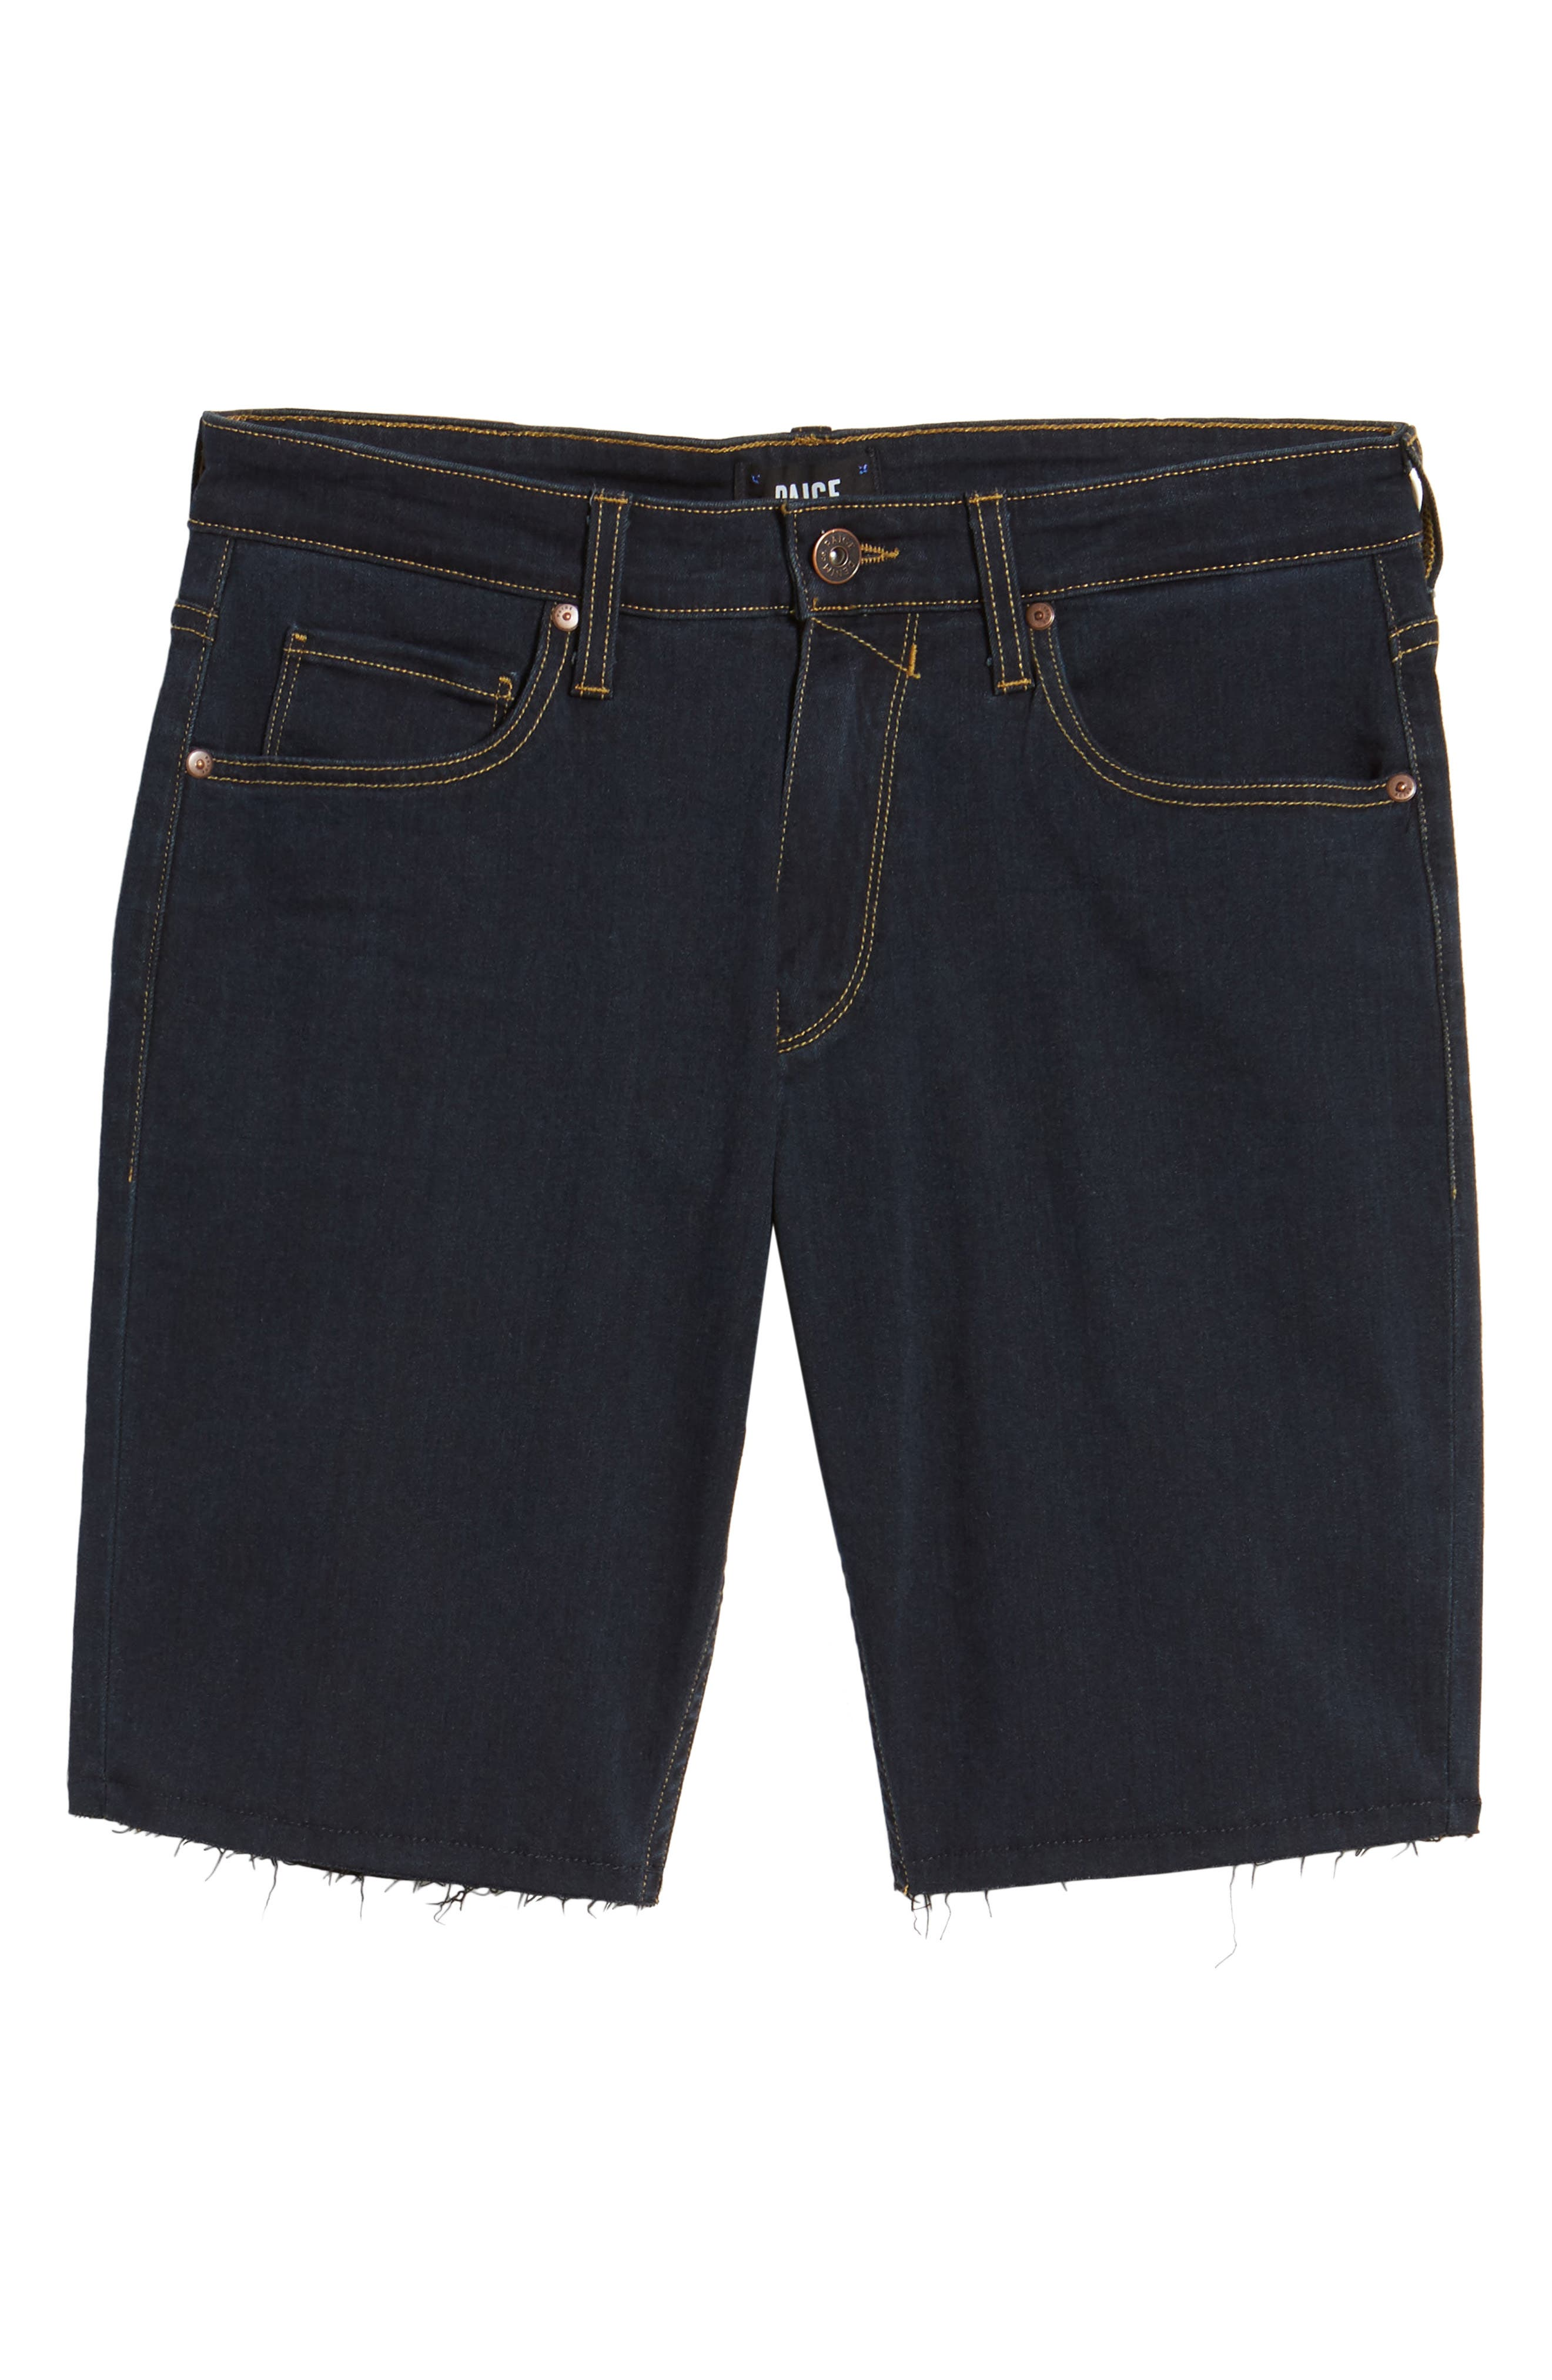 Transcend - Federal Slim Straight Leg Denim Shorts,                             Alternate thumbnail 6, color,                             Ames